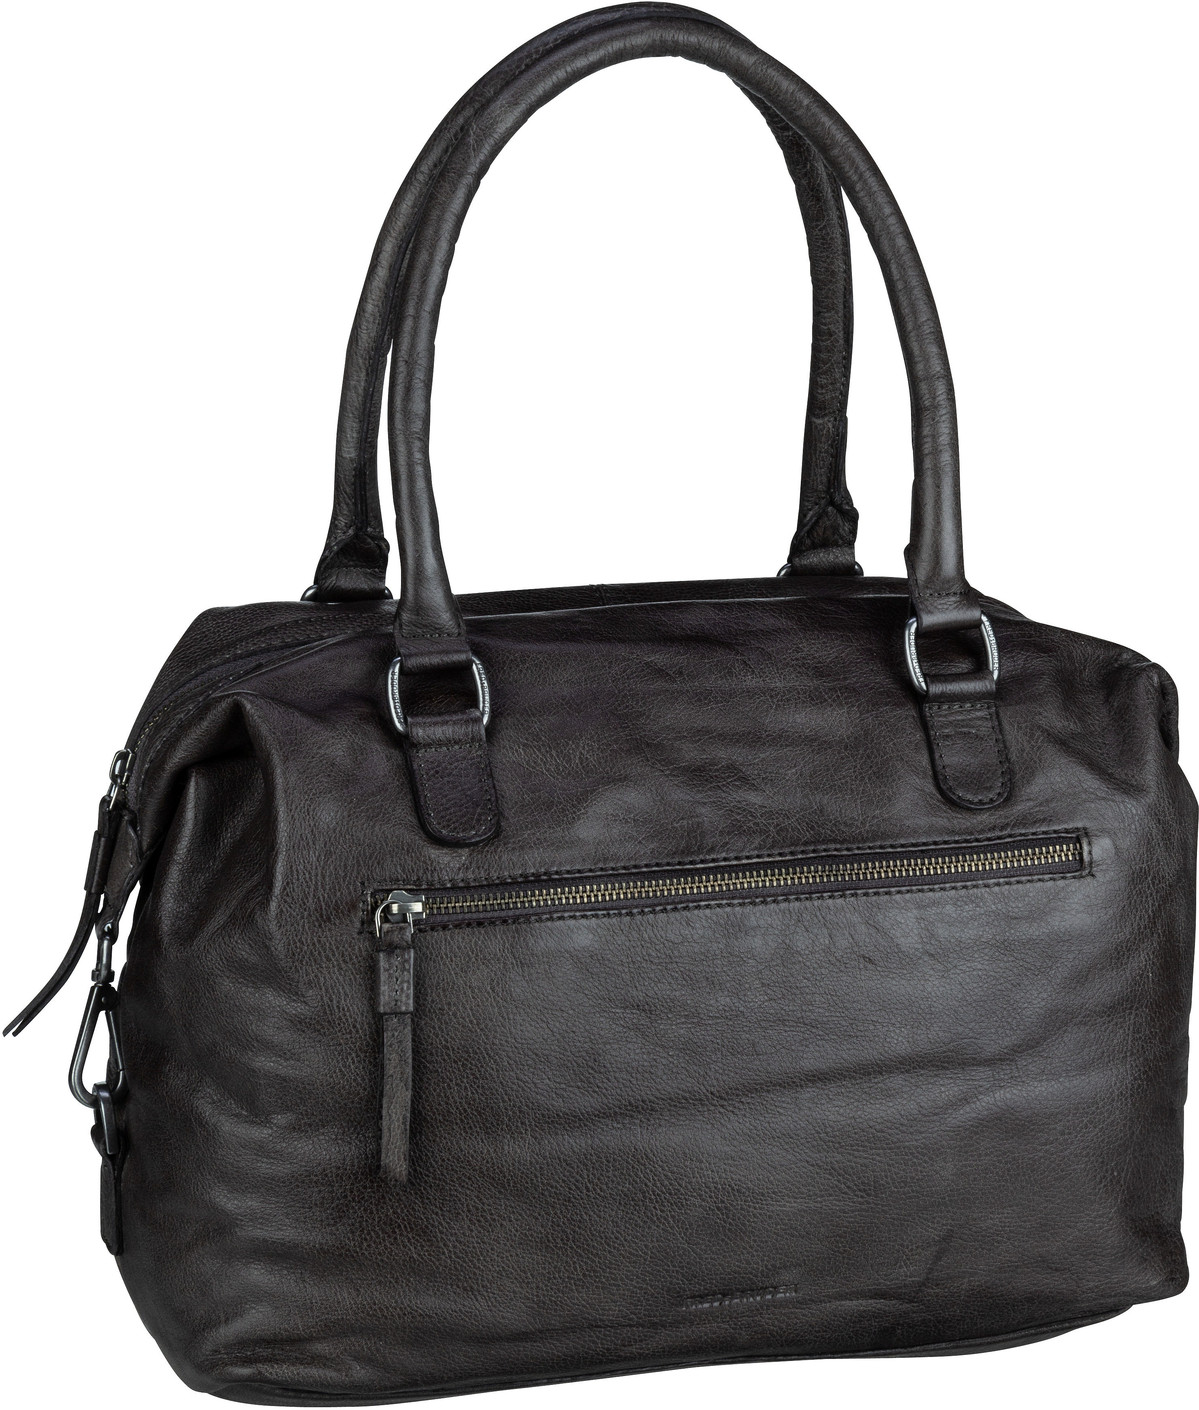 Handtasche All in Antracite